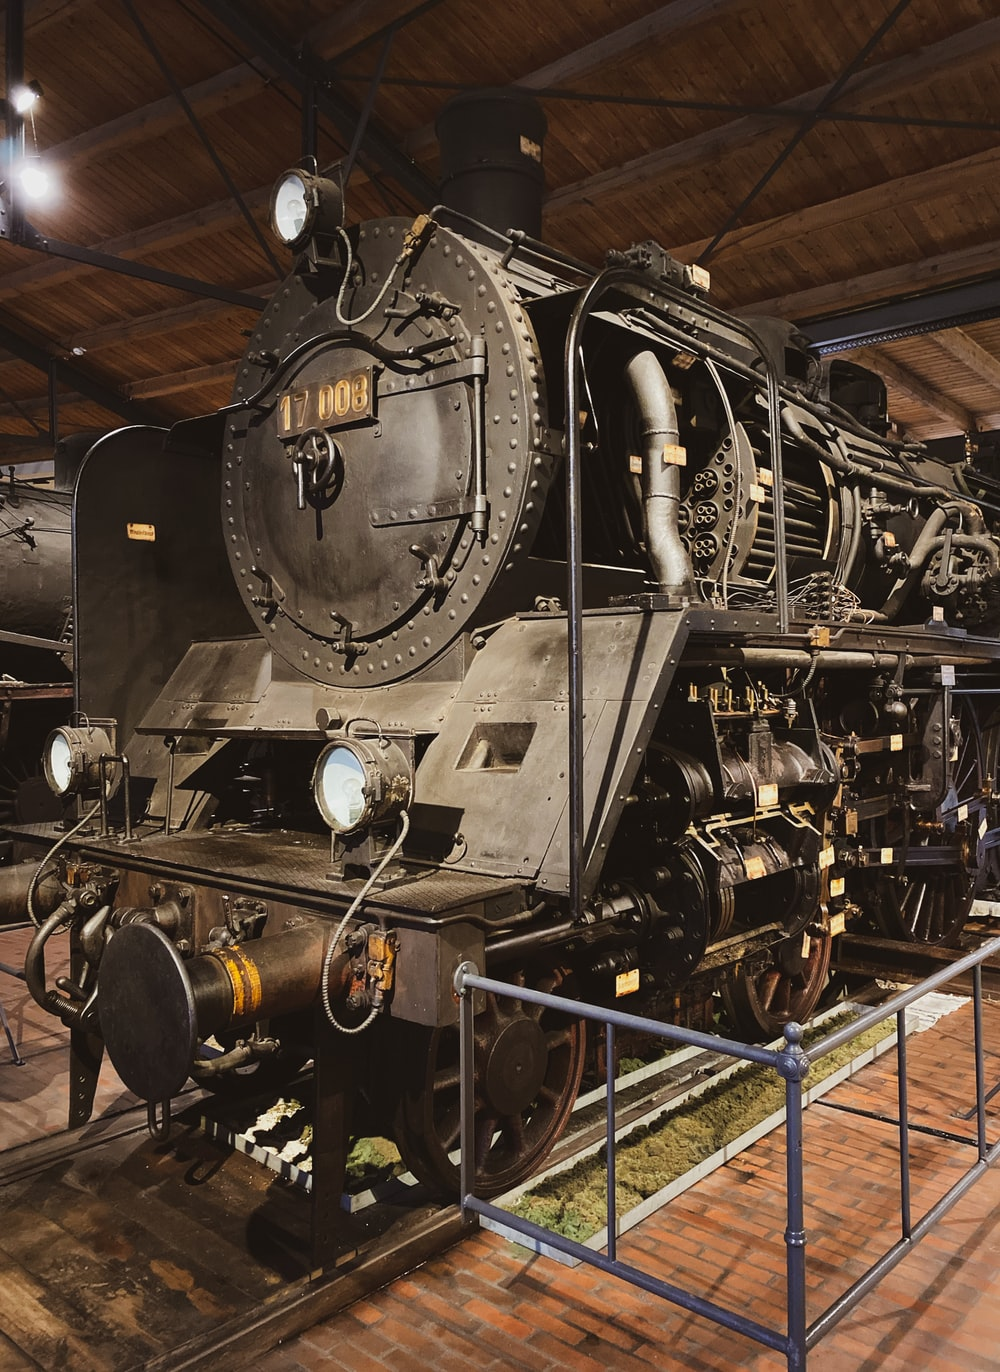 black and gray train engine